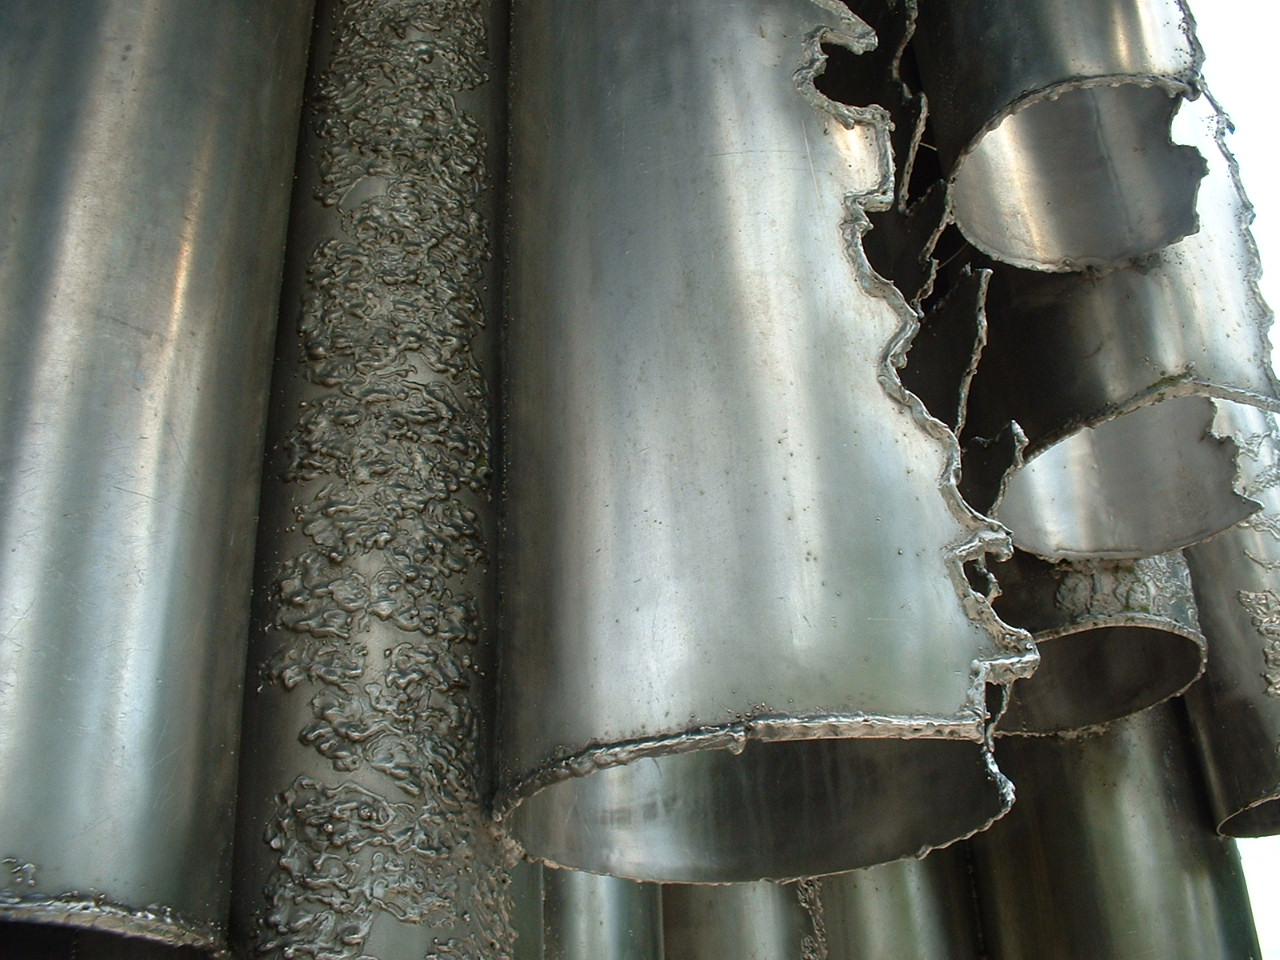 Sibelius monument close up - Helsinki